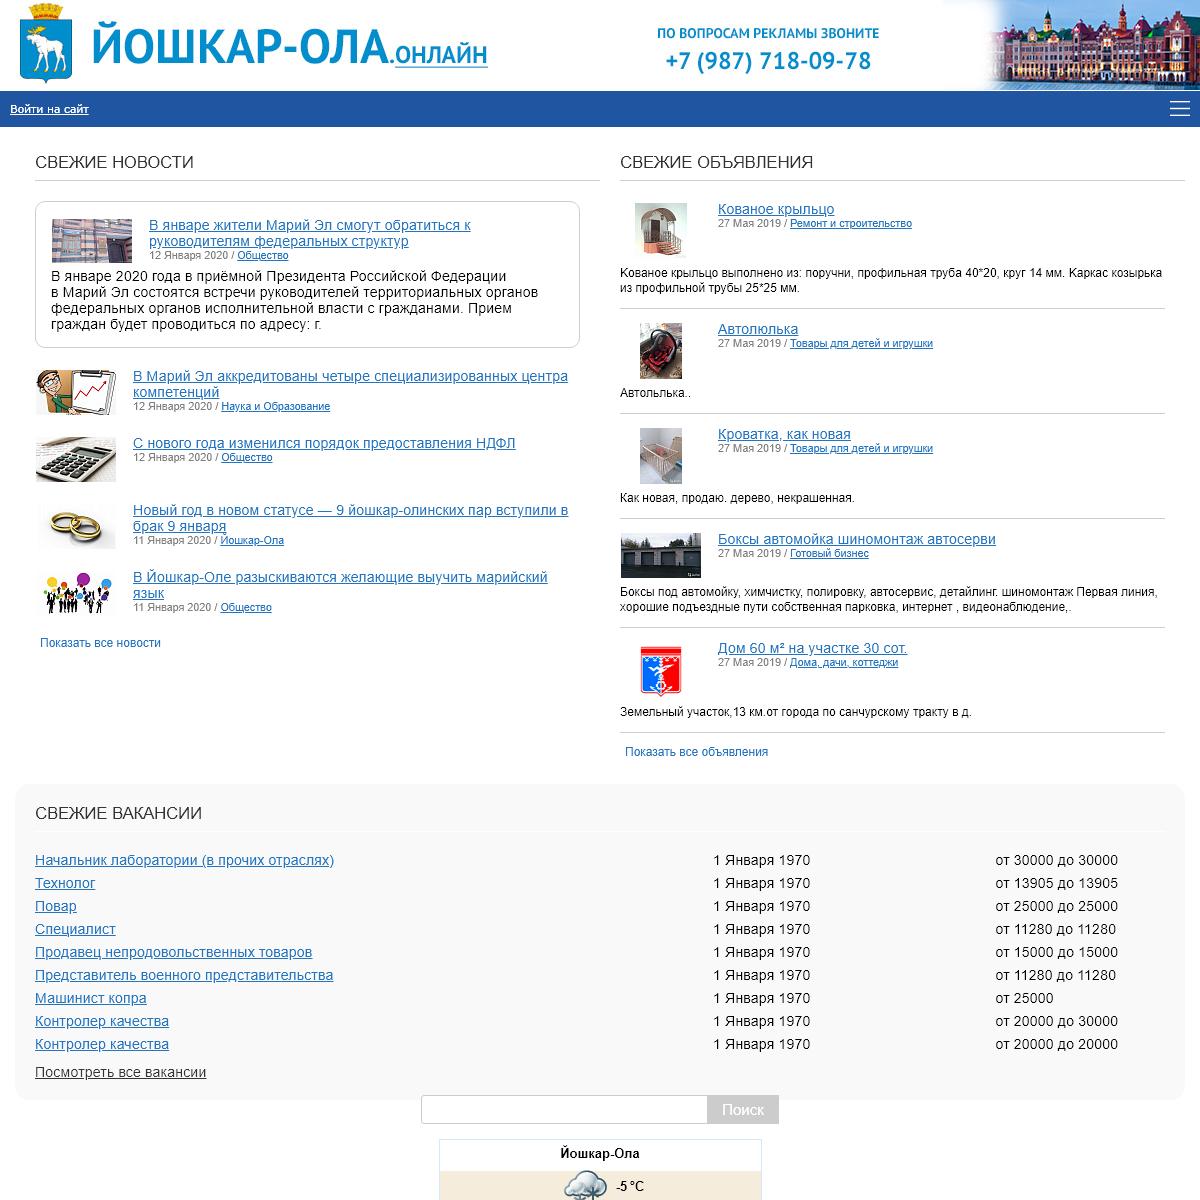 Йошкар-Ола.онлайн - новости Йошкар-Олу, работа в Йошкар-Оле, погода в Йо